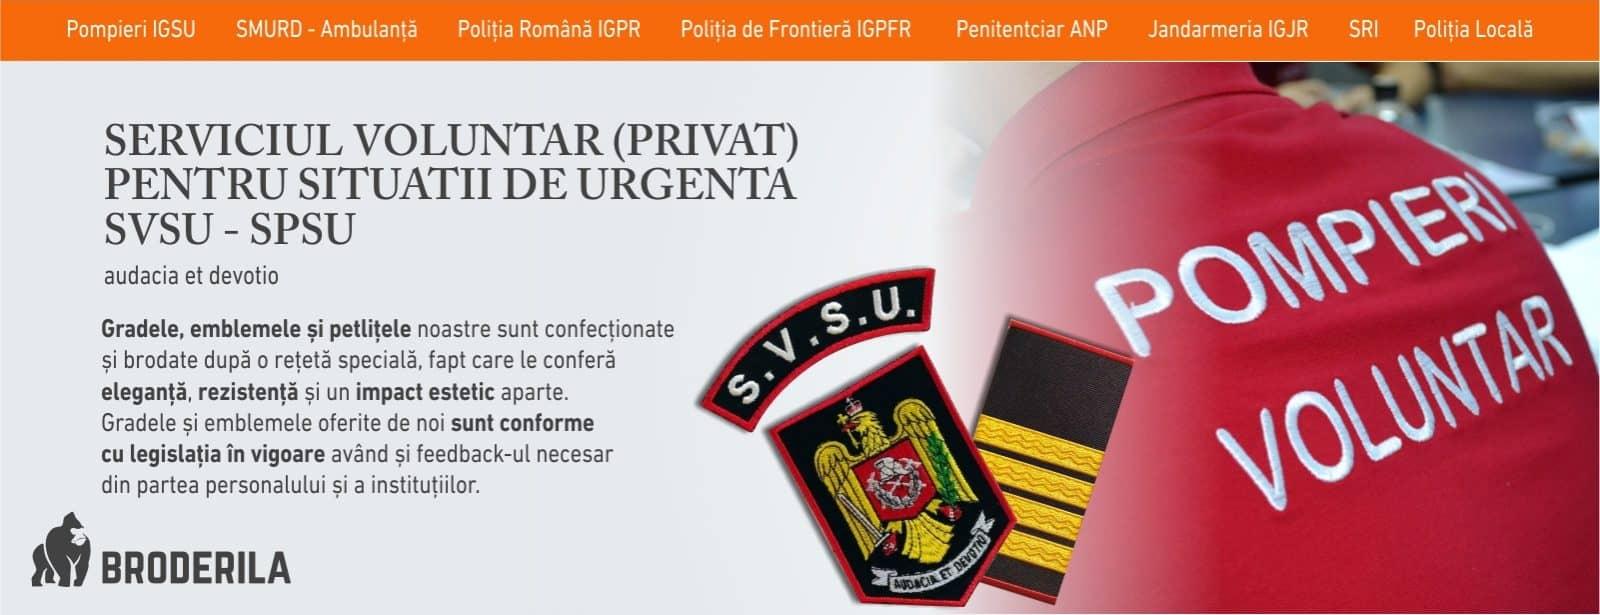 Serviciul Voluntar privat pentru Situatii de Urgenta SVSU SPSU grade militare broderie brodarila.ro emblema brodata svsu